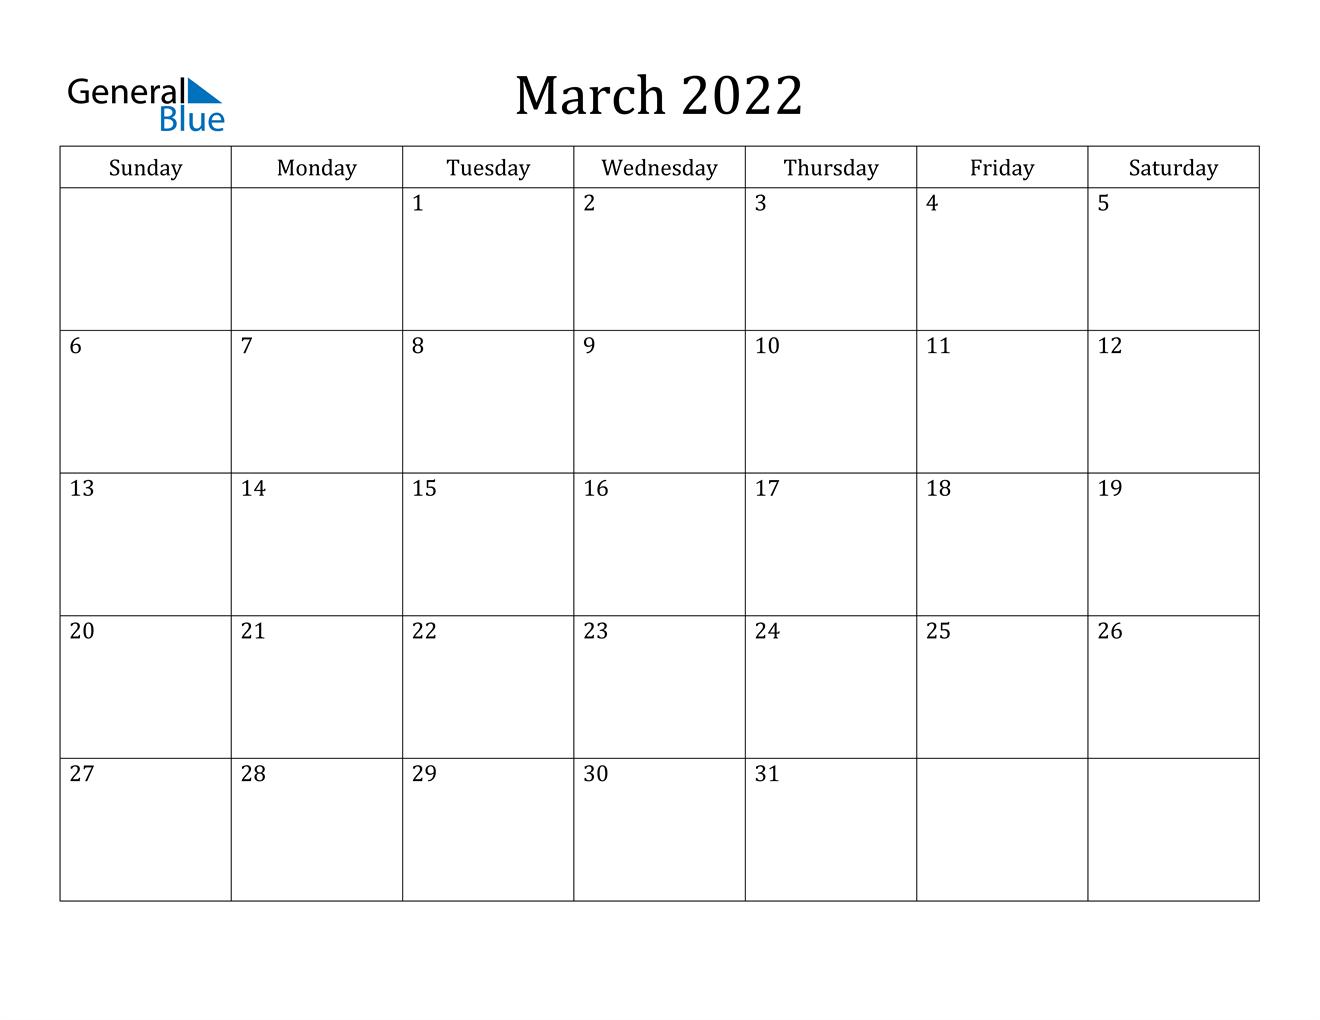 March 2022 Calendar (Pdf Word Excel) Regarding February March And April 2022 Calendar